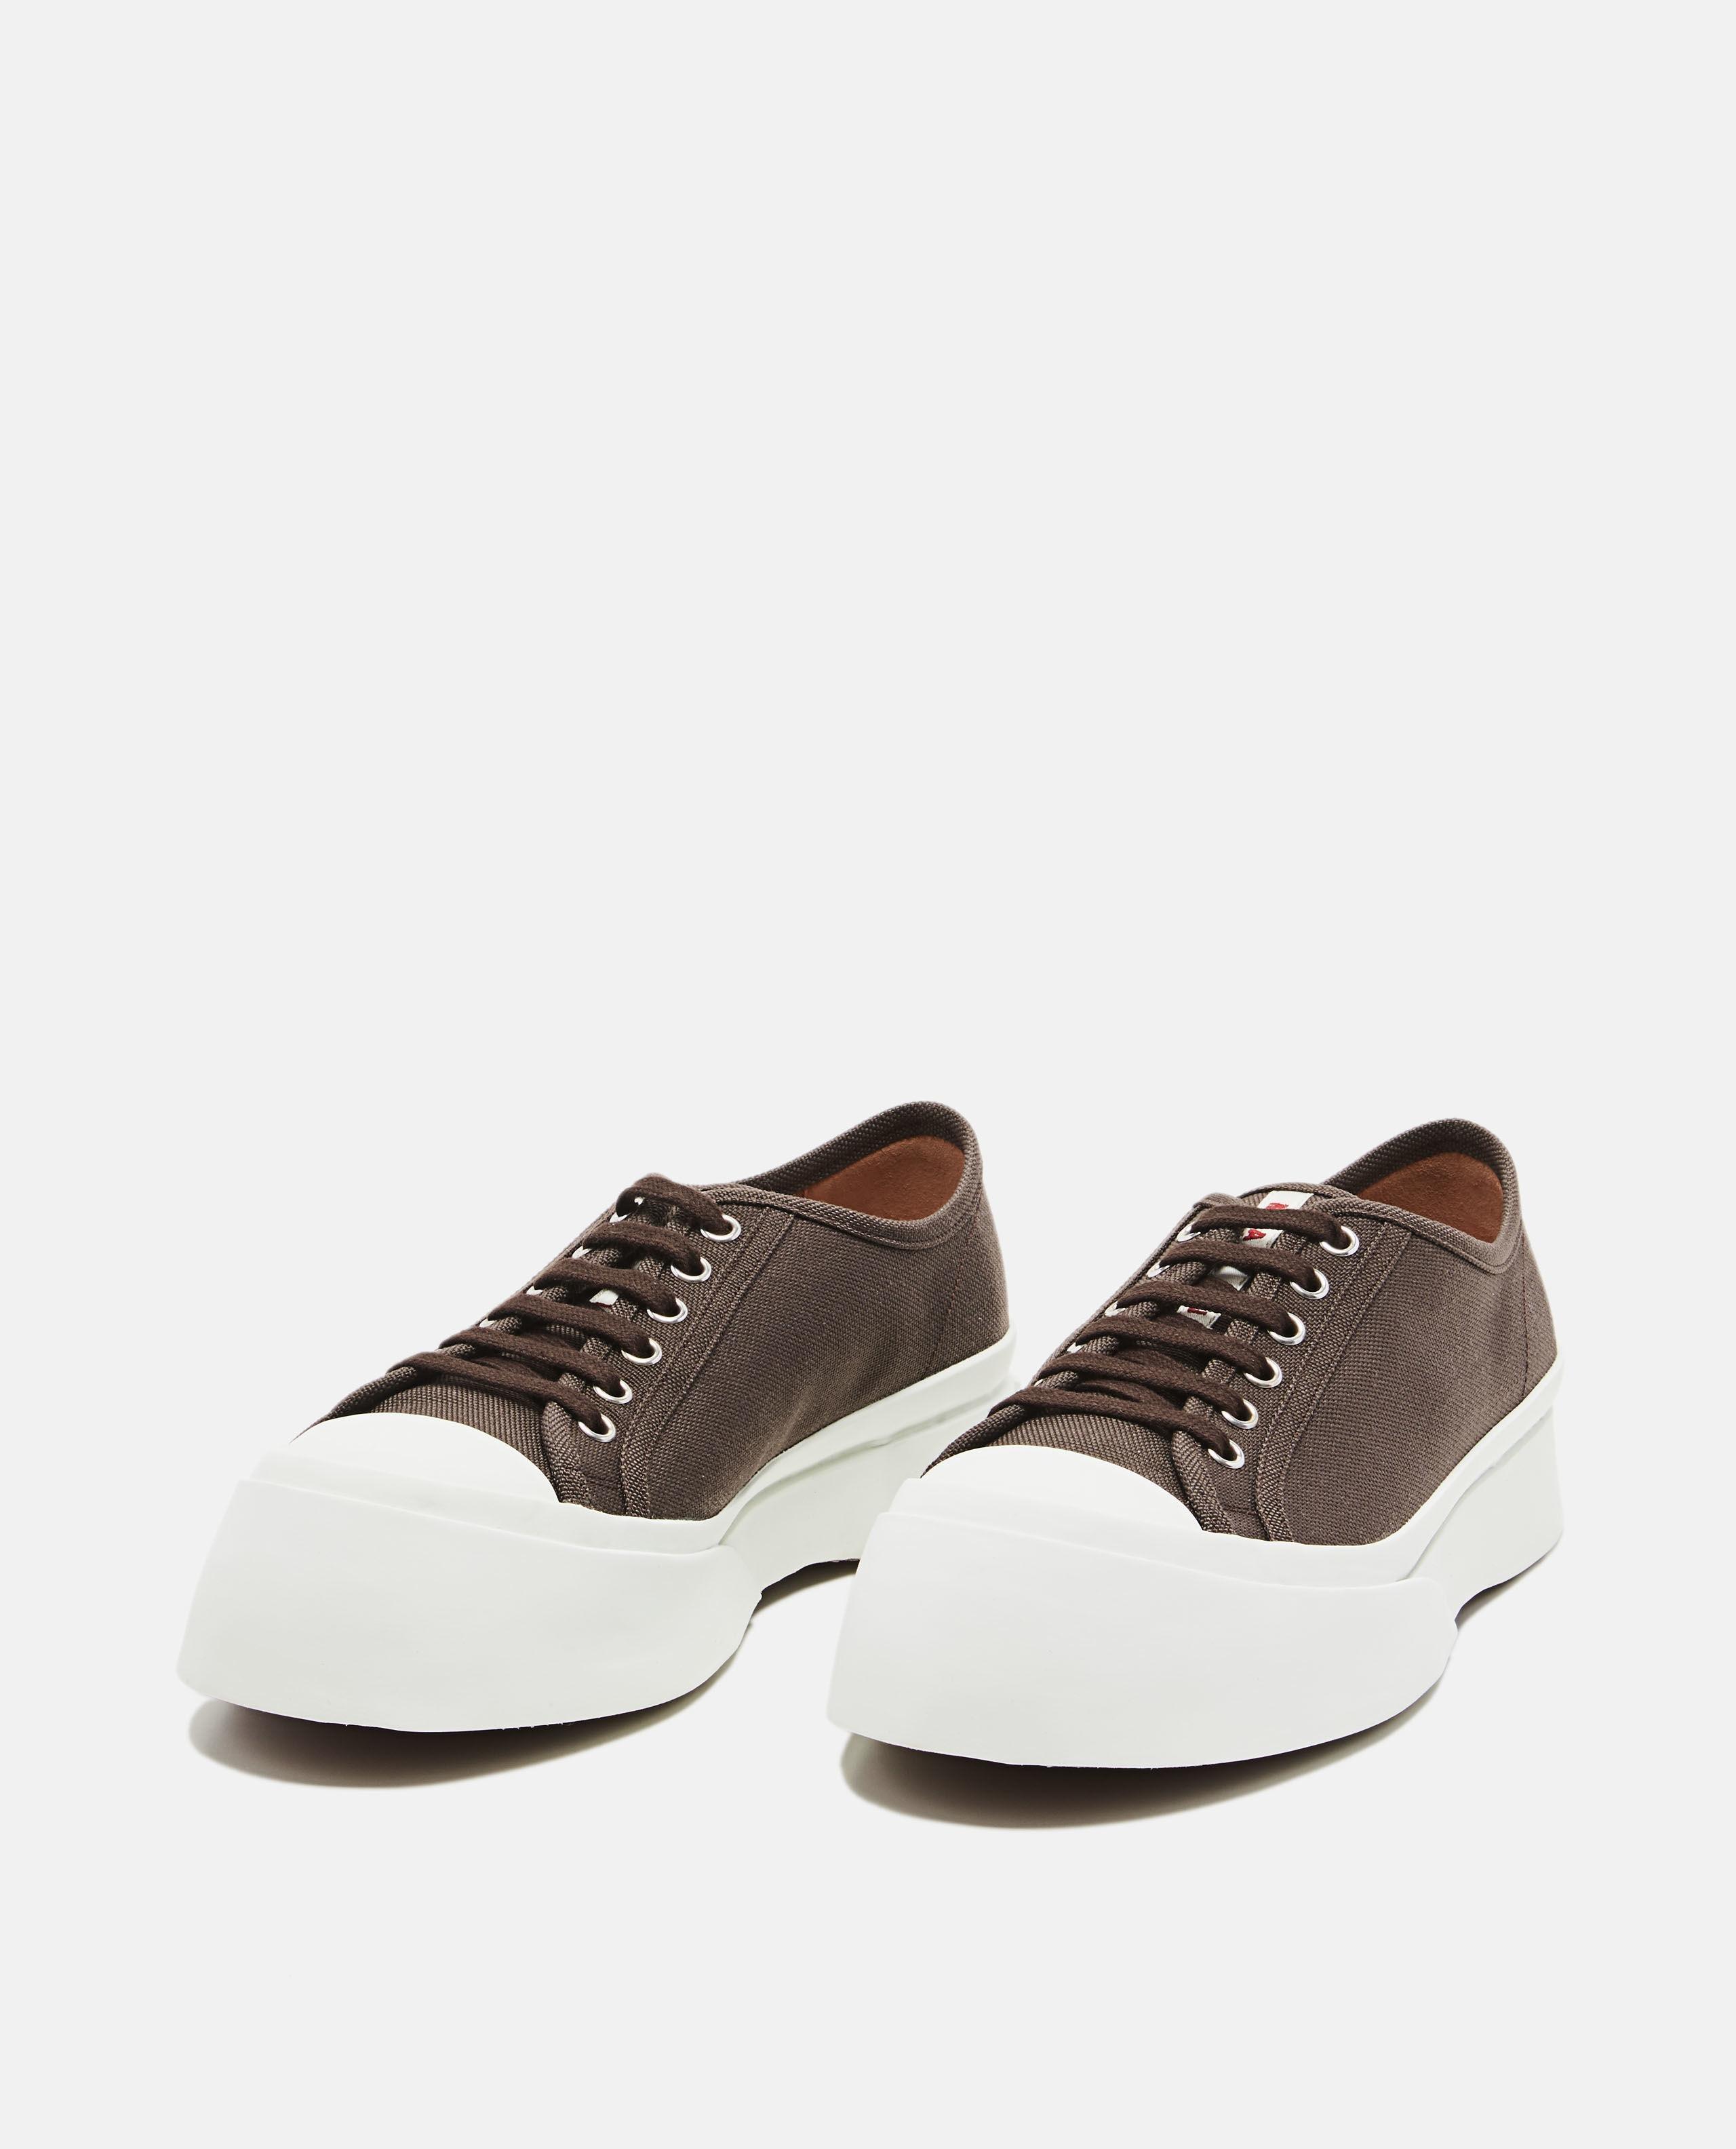 3bbbf74fd53 Lyst - Marni Platform Sneakers in Black